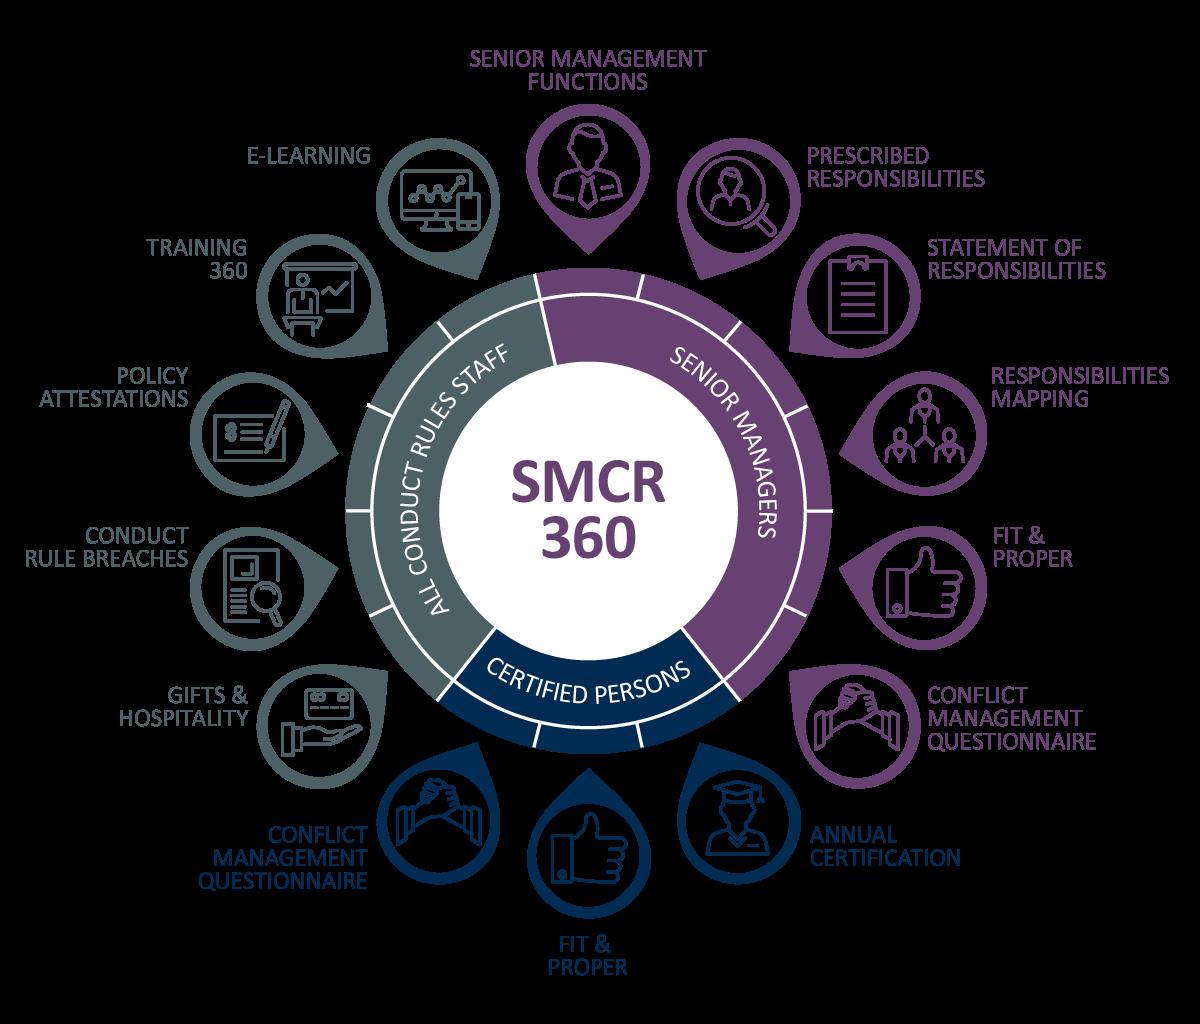 SMCR 360 Compliance Portal Features